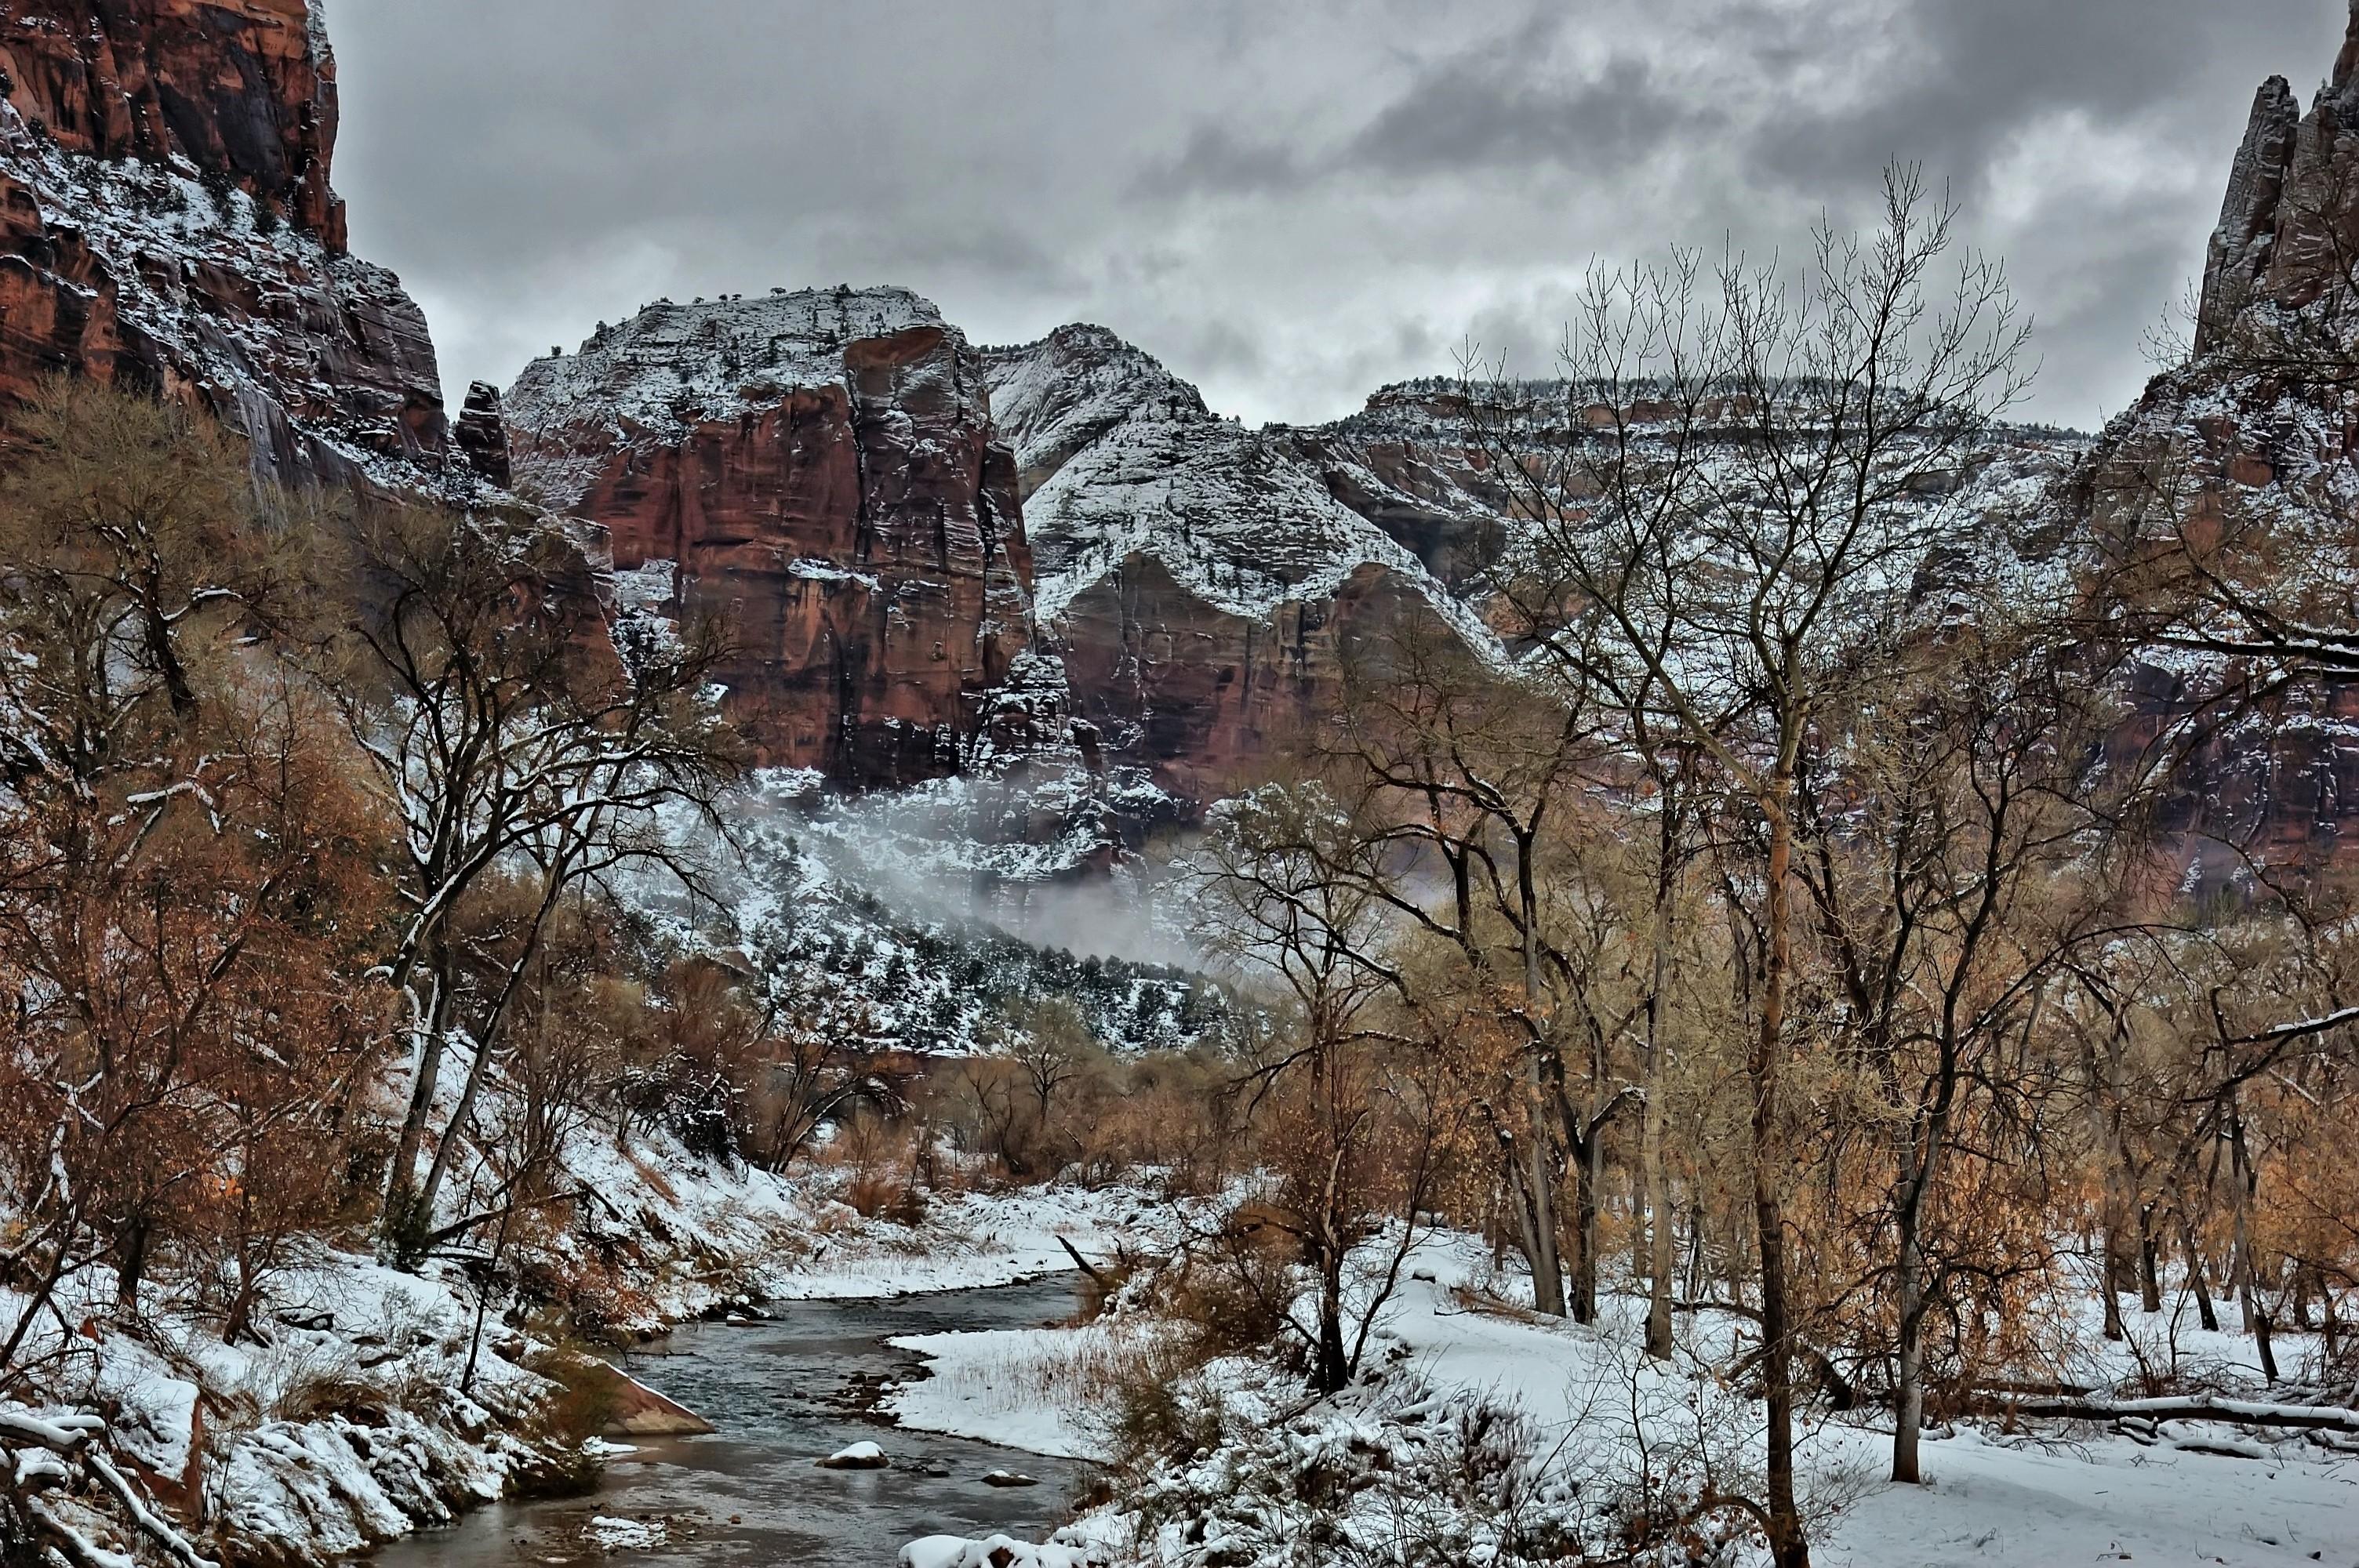 Zion National Park, Zion, Utah, winter